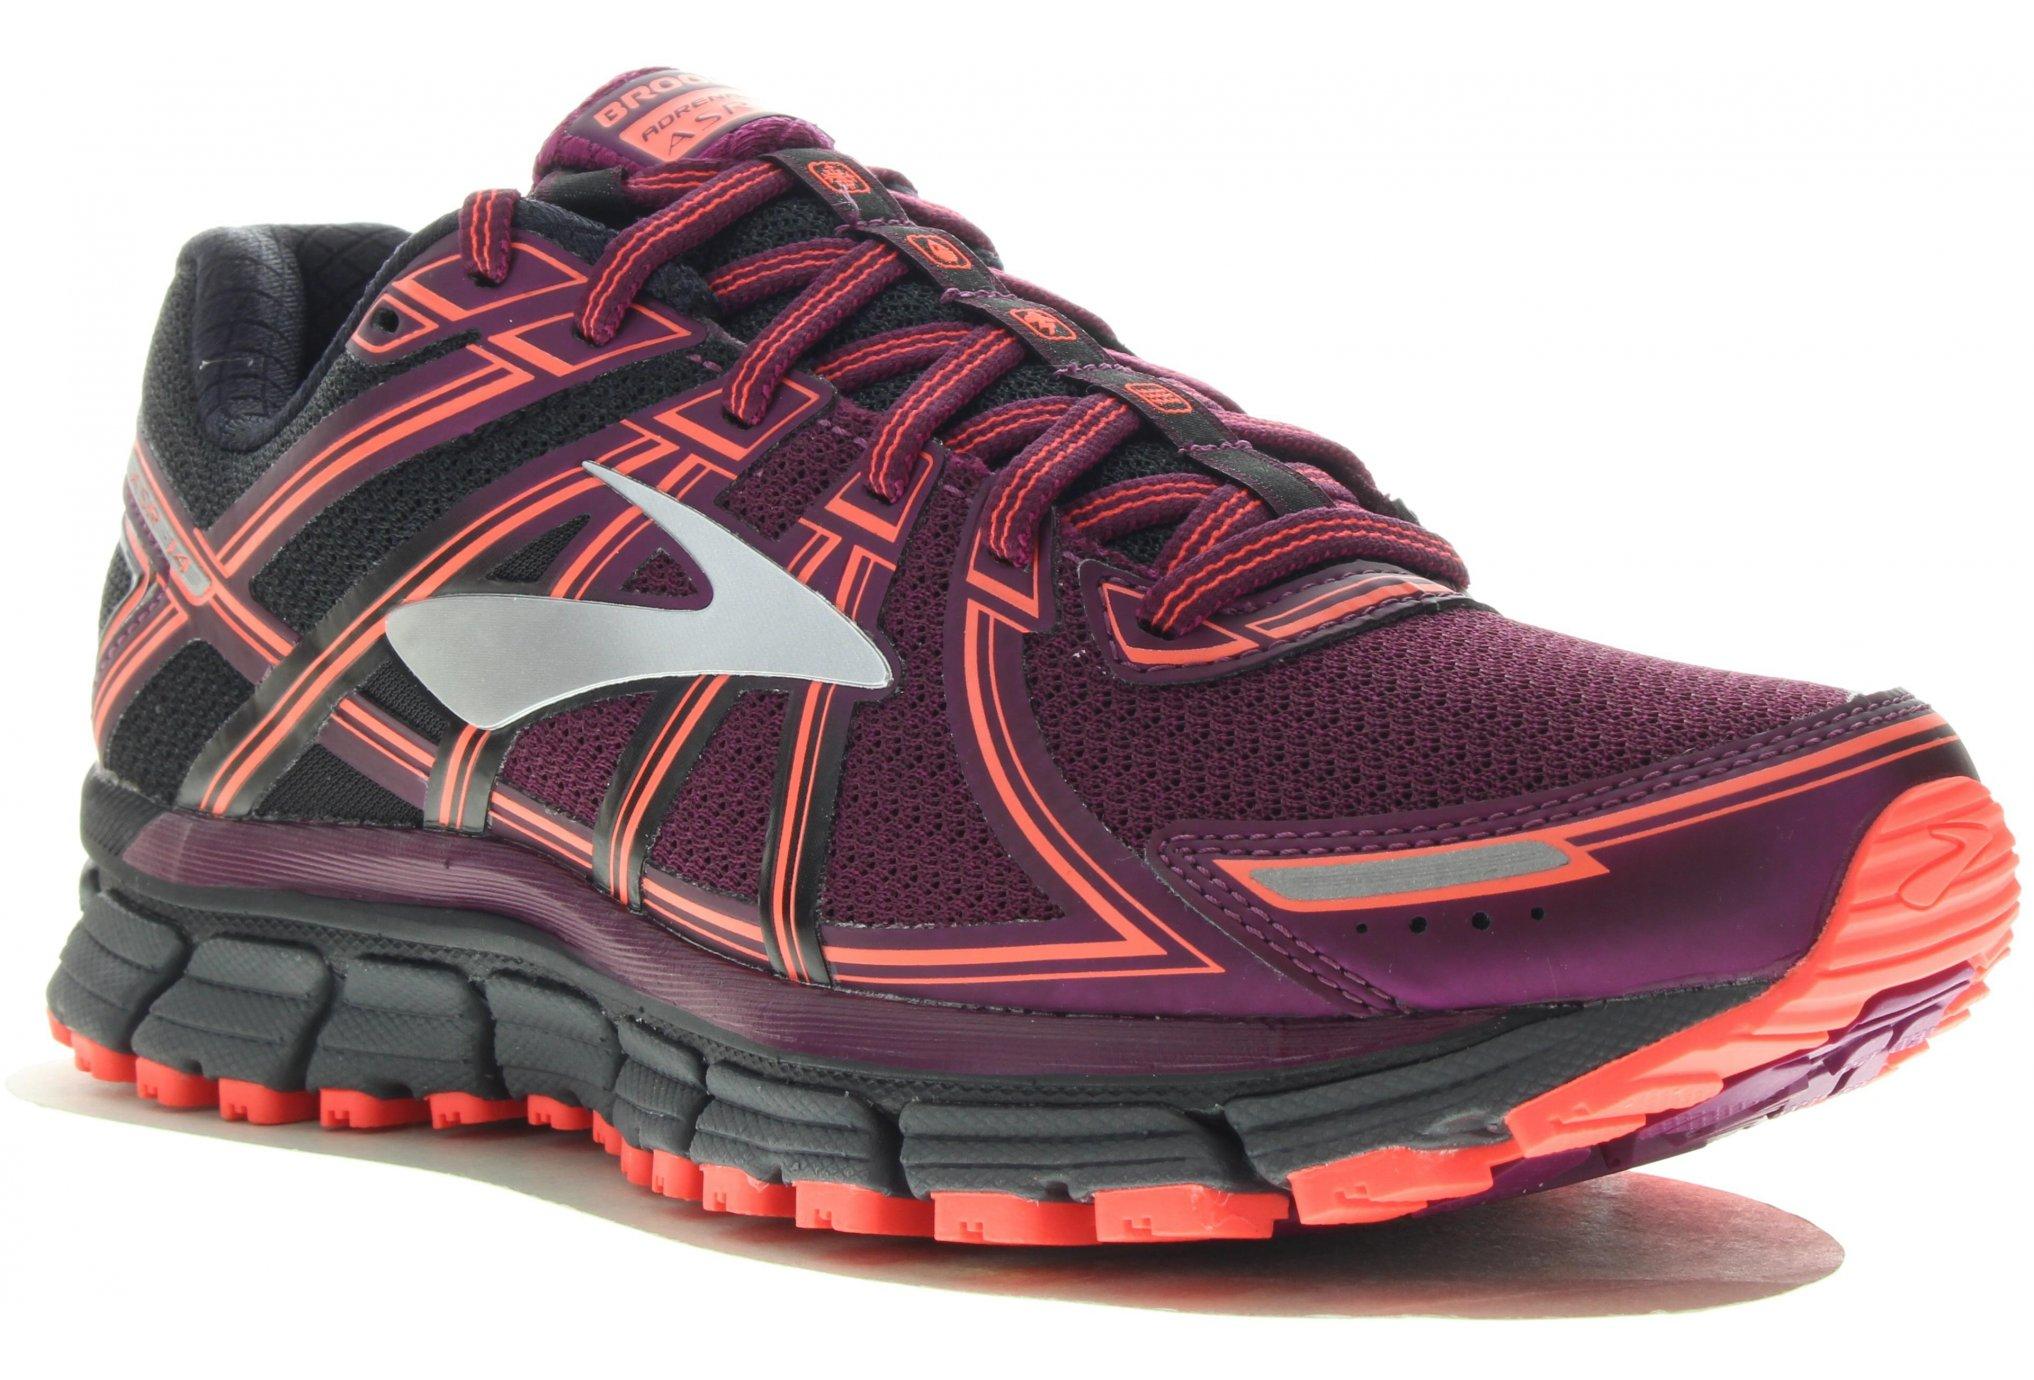 Brooks Adrenaline asr 14 w chaussures running femme